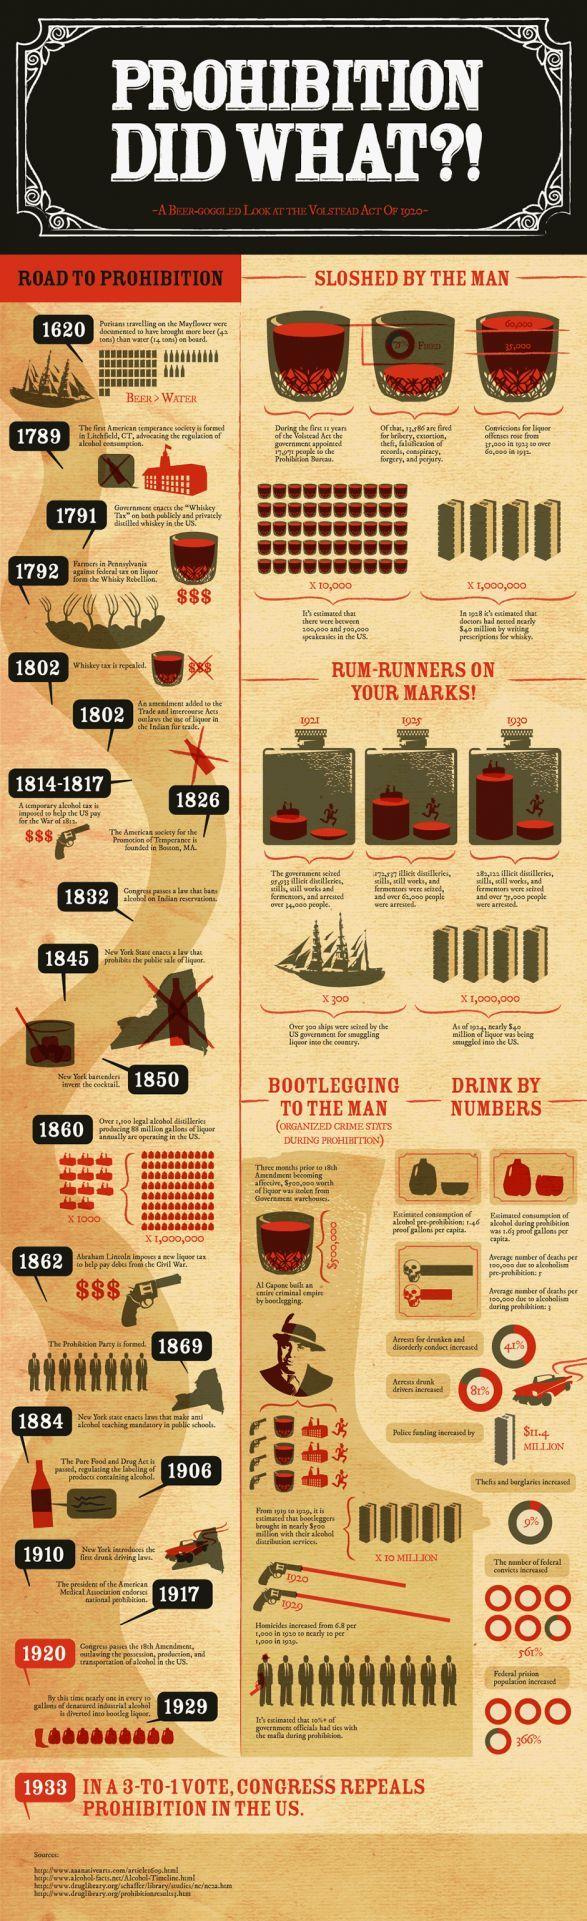 worksheet Progressive Era Worksheet 1000 images about progressive era on pinterest labor crash interesting history